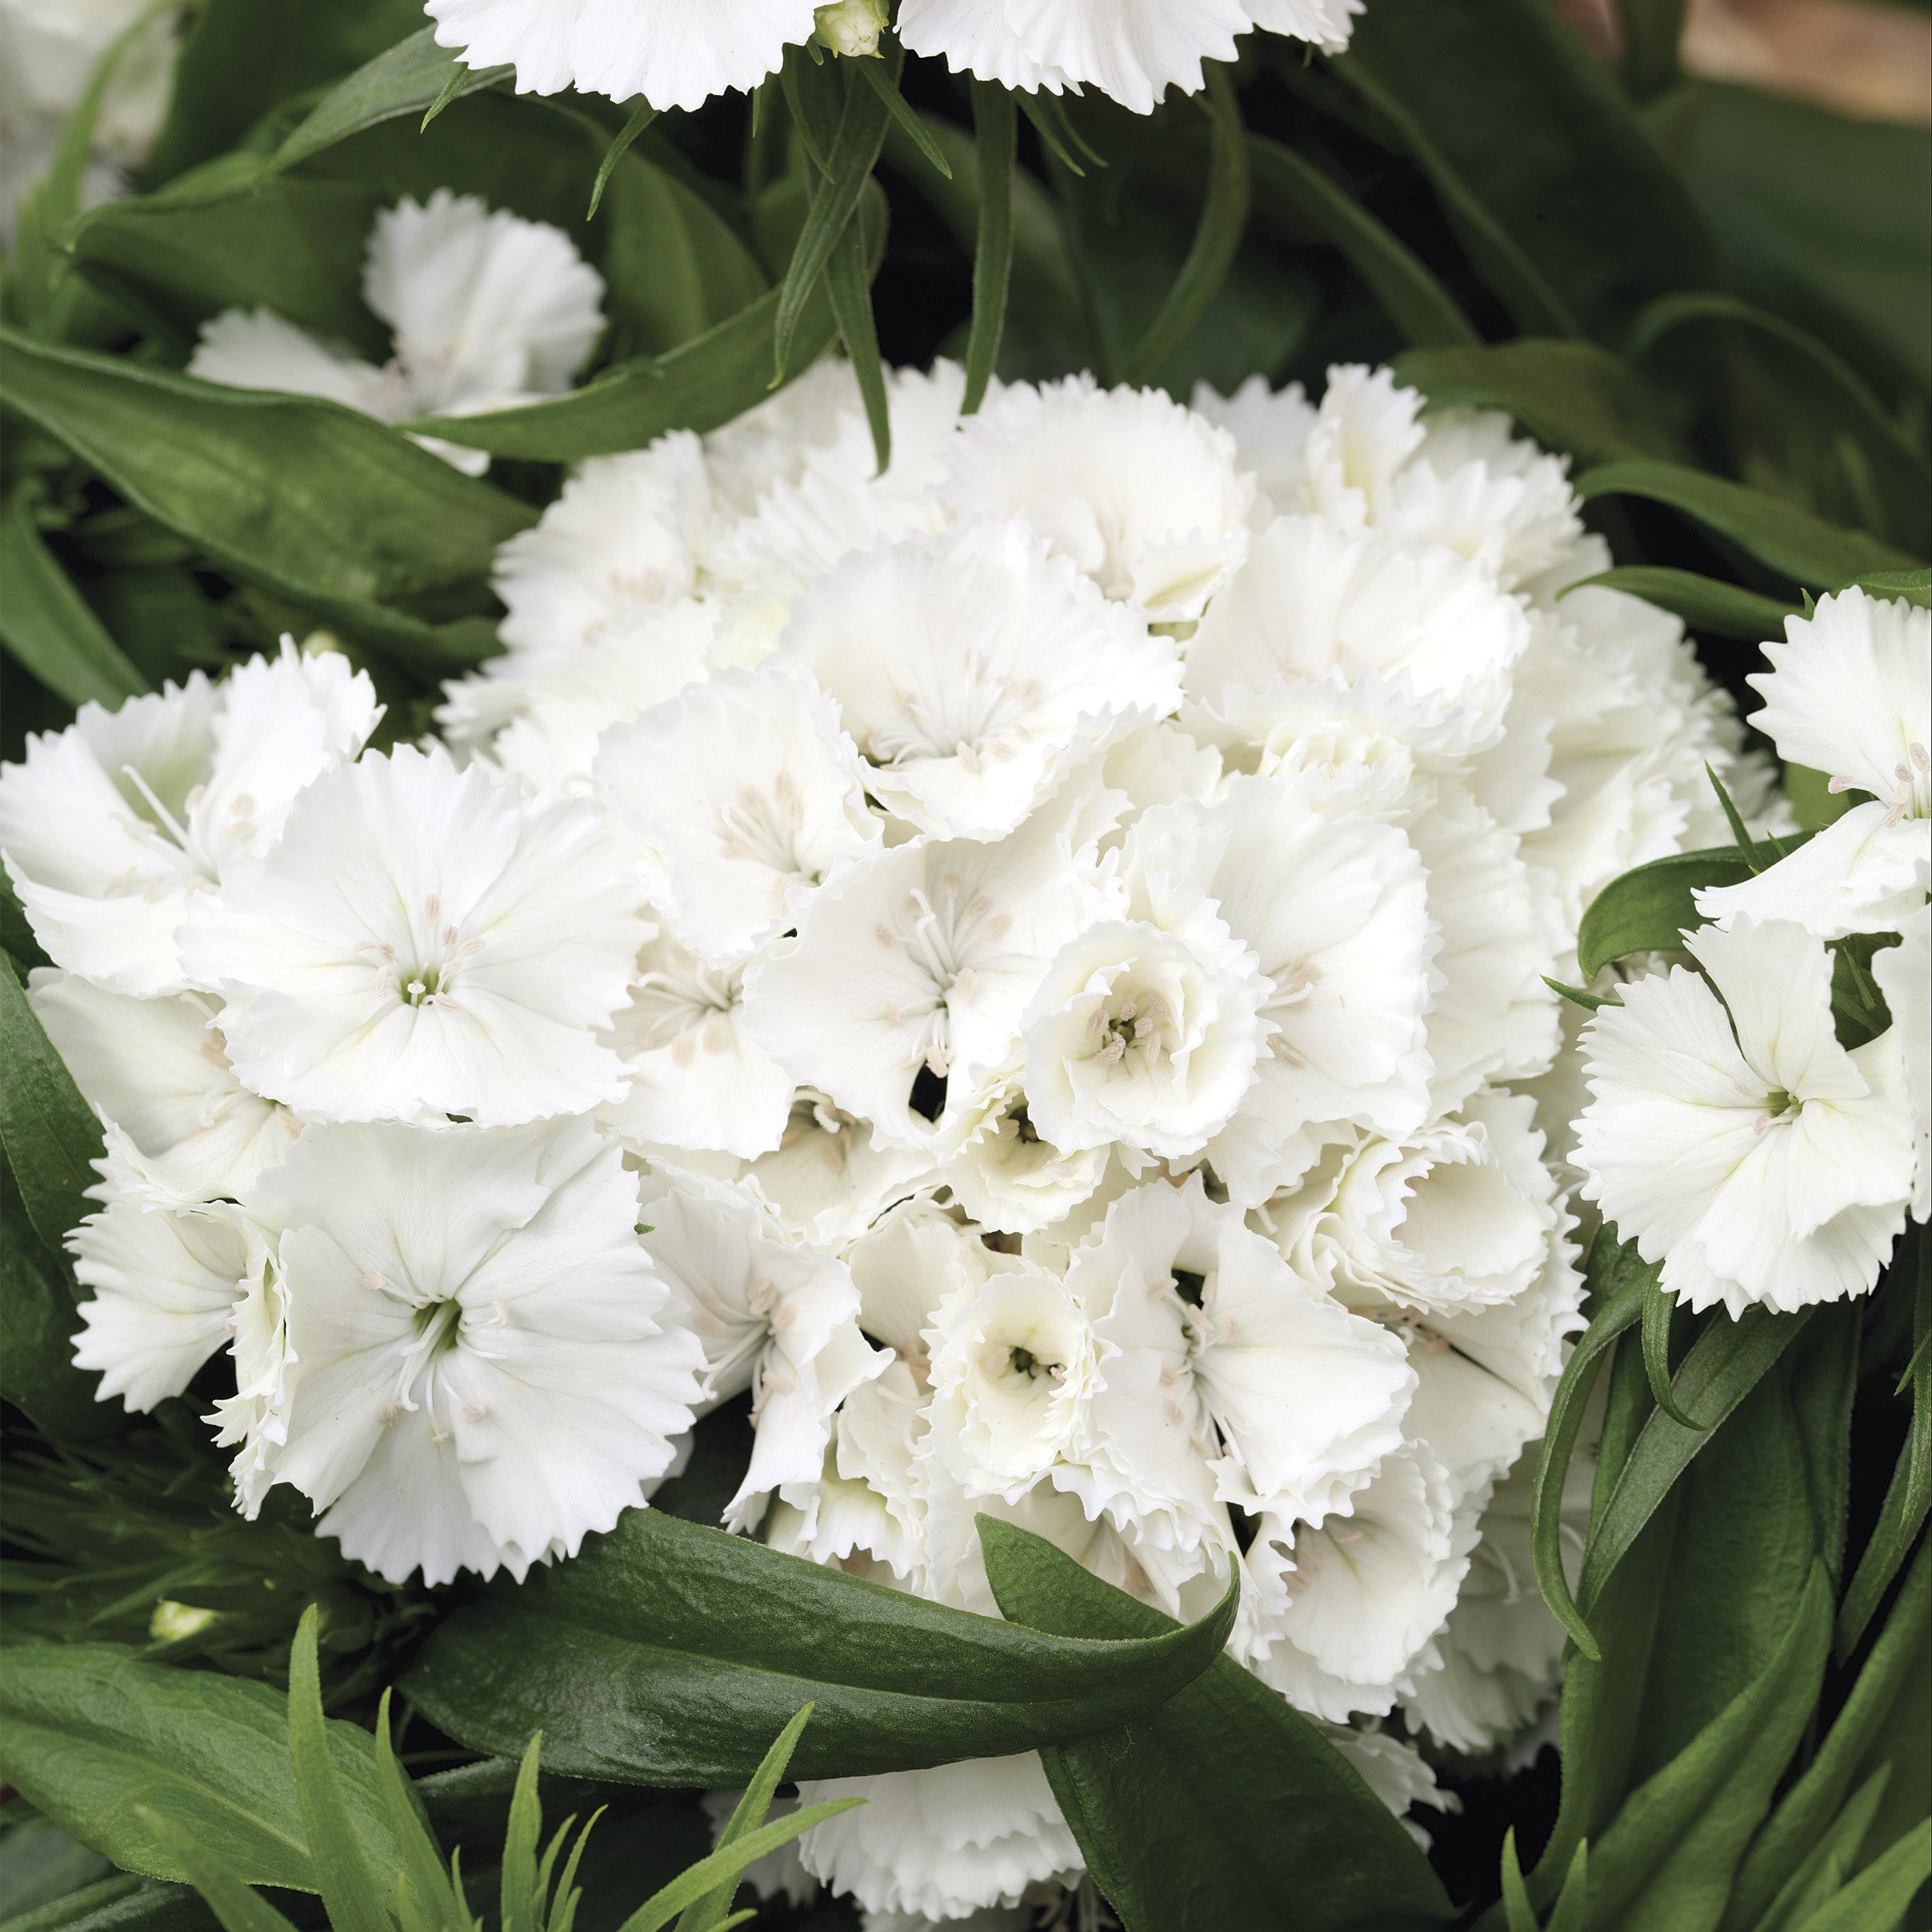 HR_Seed_Dianthus_Barbarini®_Barbarini®_White_70001026_1.jpg